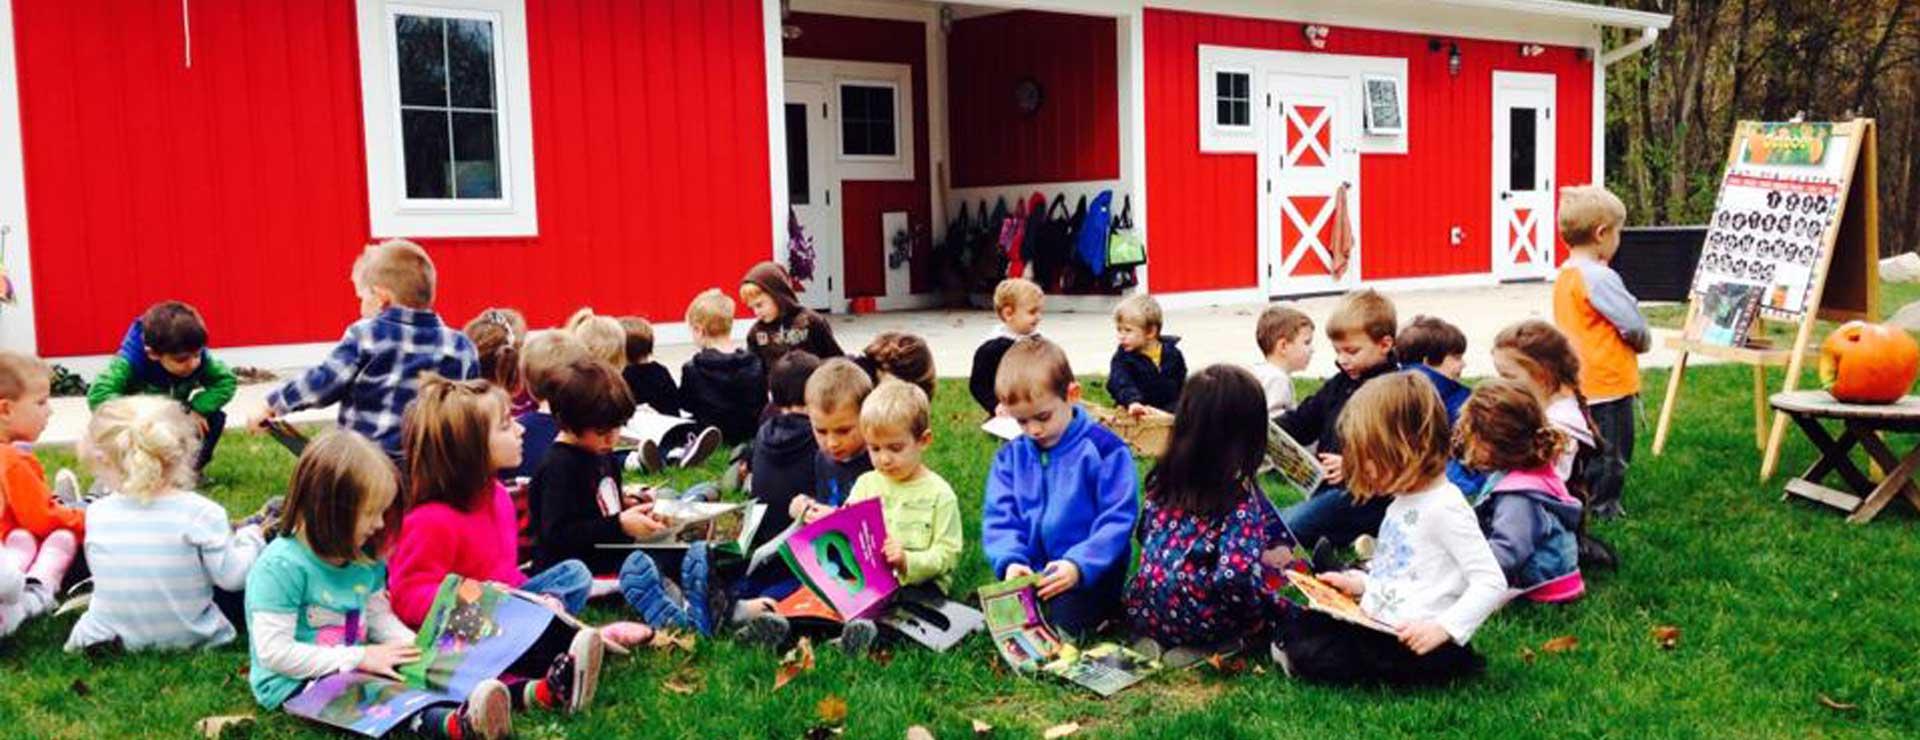 canterbury-creek-farm-preschool-grand-rapids-mi-childhood-development